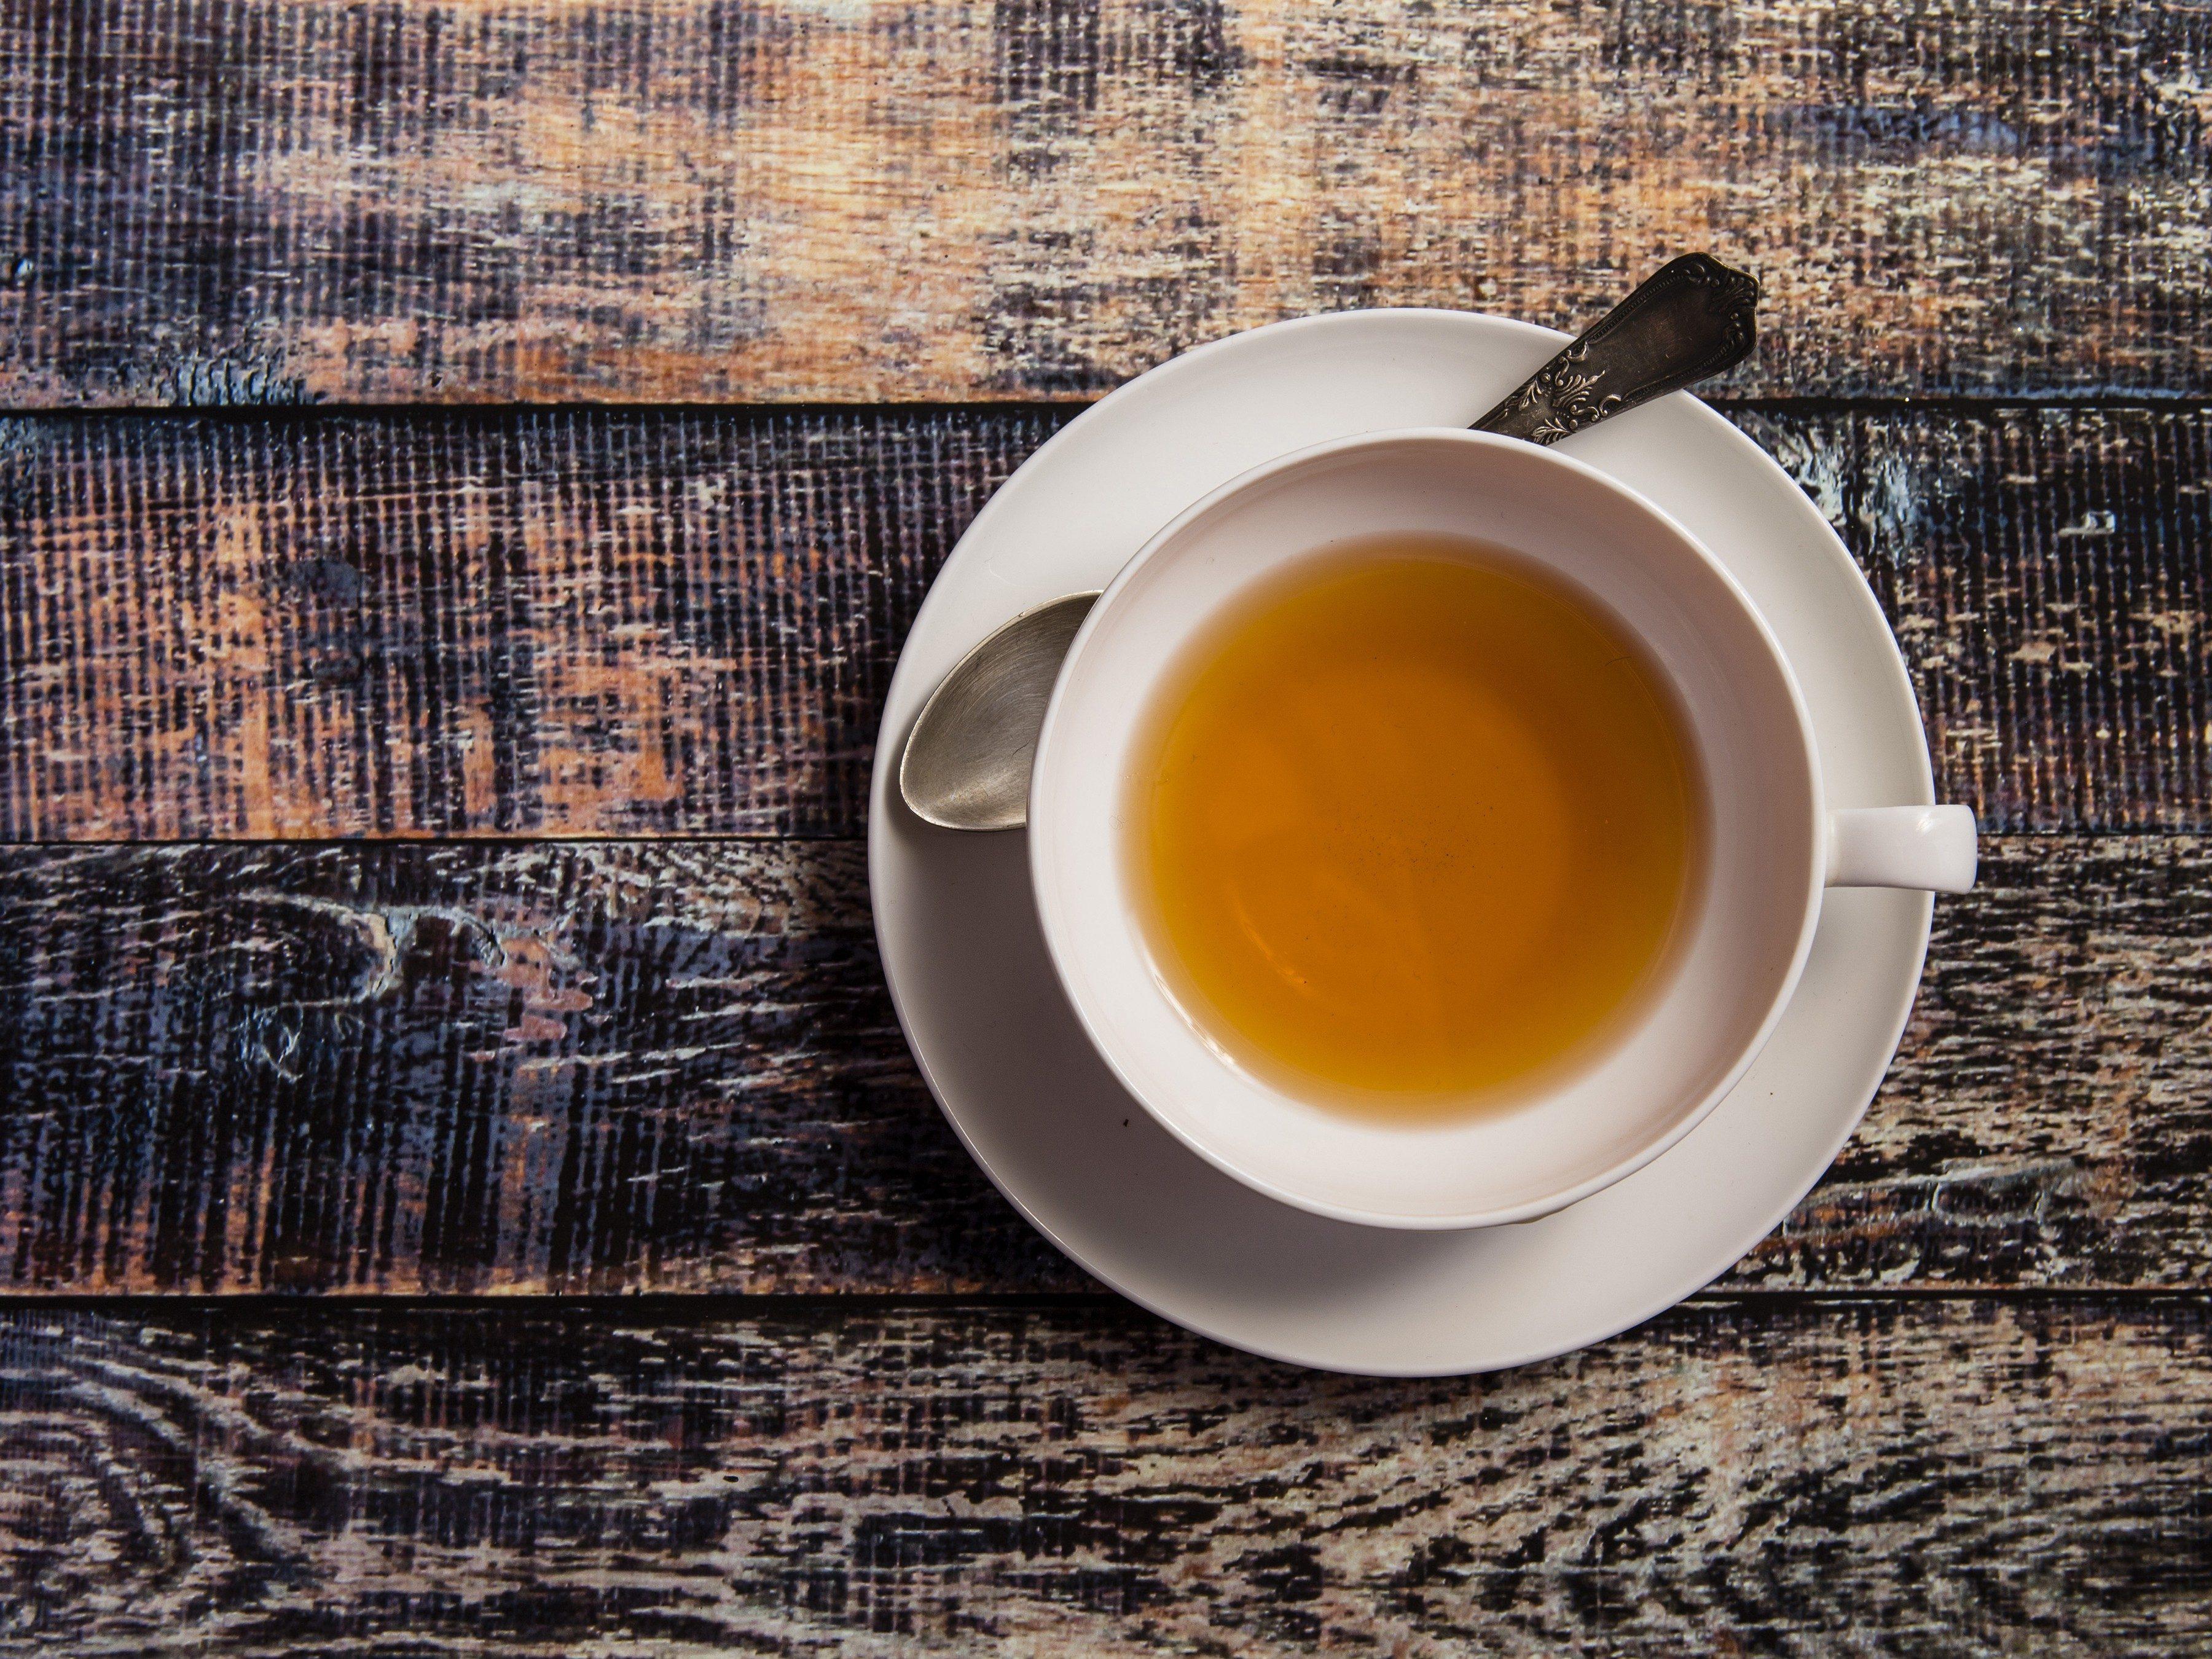 Home remedies for nausea - herbal tea